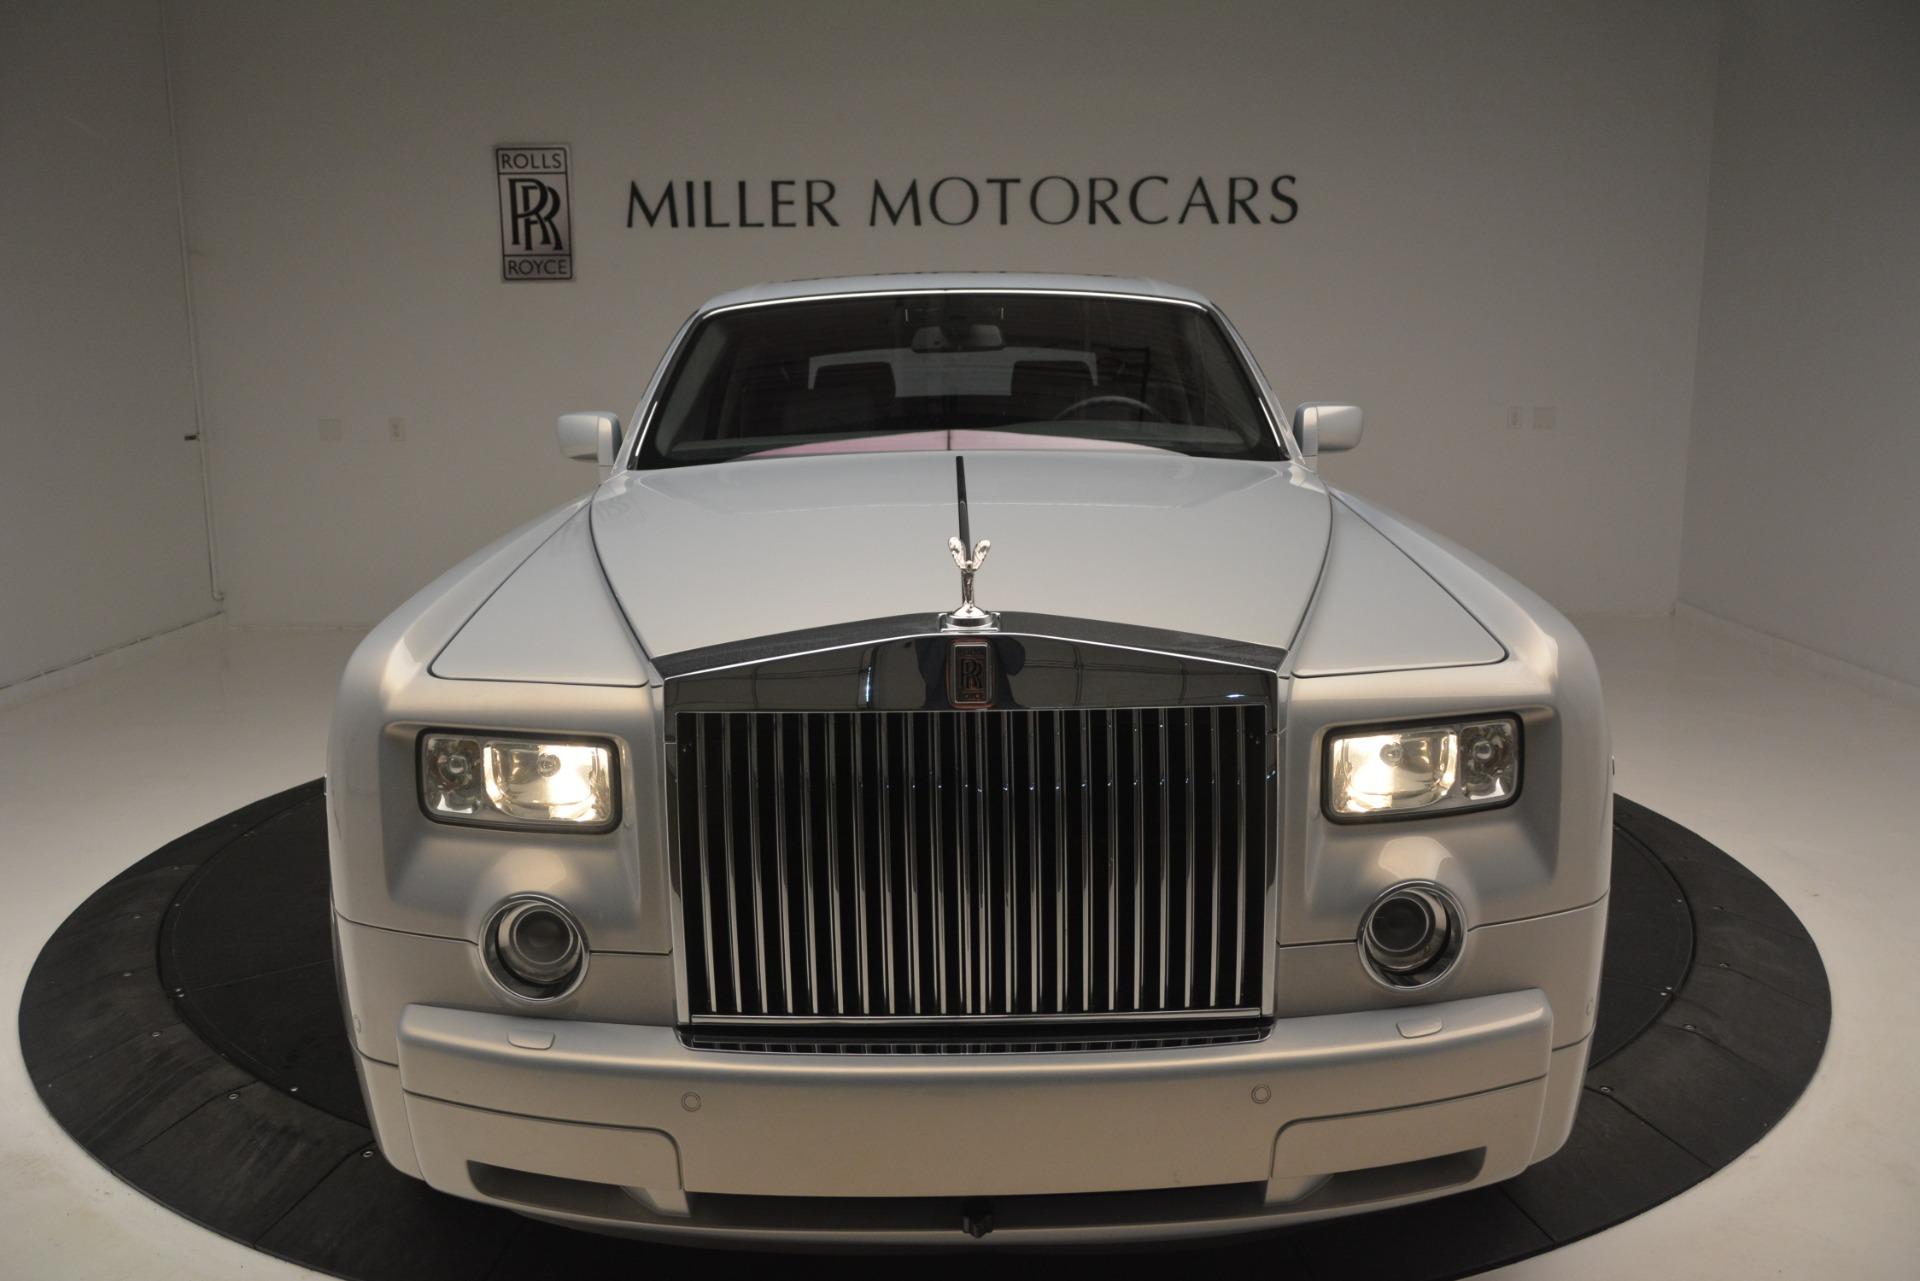 Used 2007 Rolls-Royce Phantom  For Sale In Greenwich, CT. Alfa Romeo of Greenwich, R483A 3089_p6